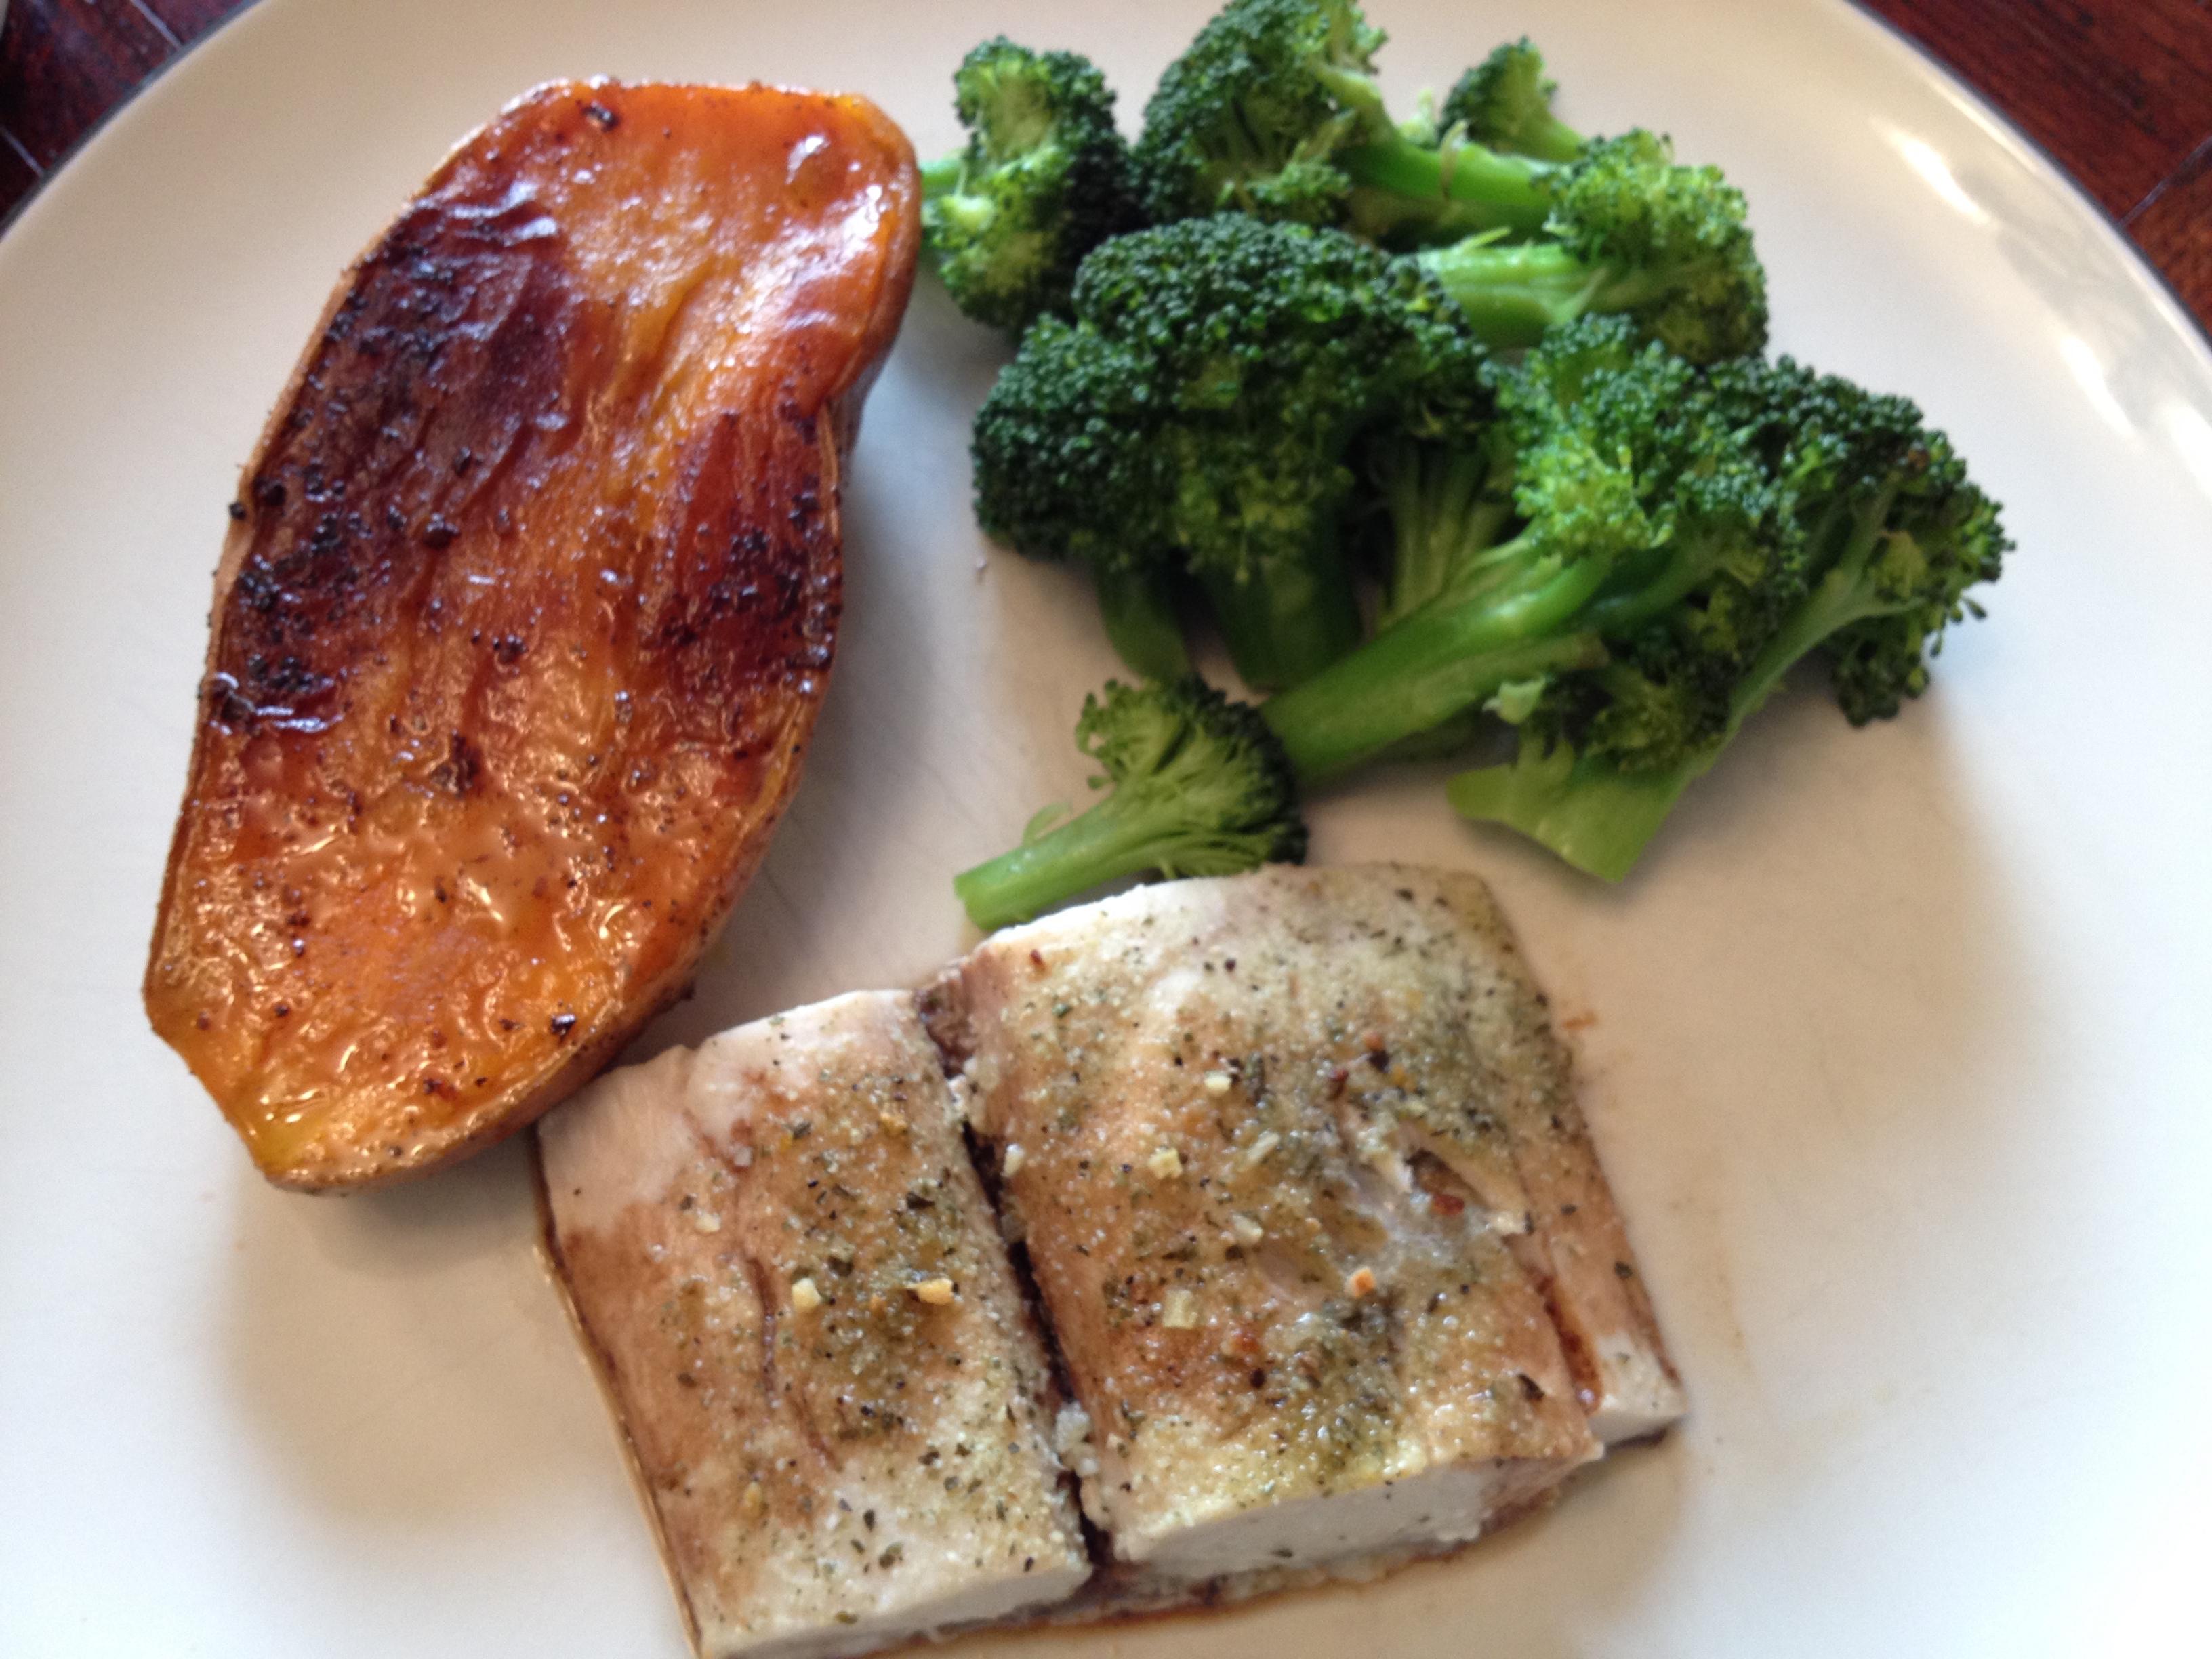 Roasted Sweet Potatoes & Roasted Broccoli